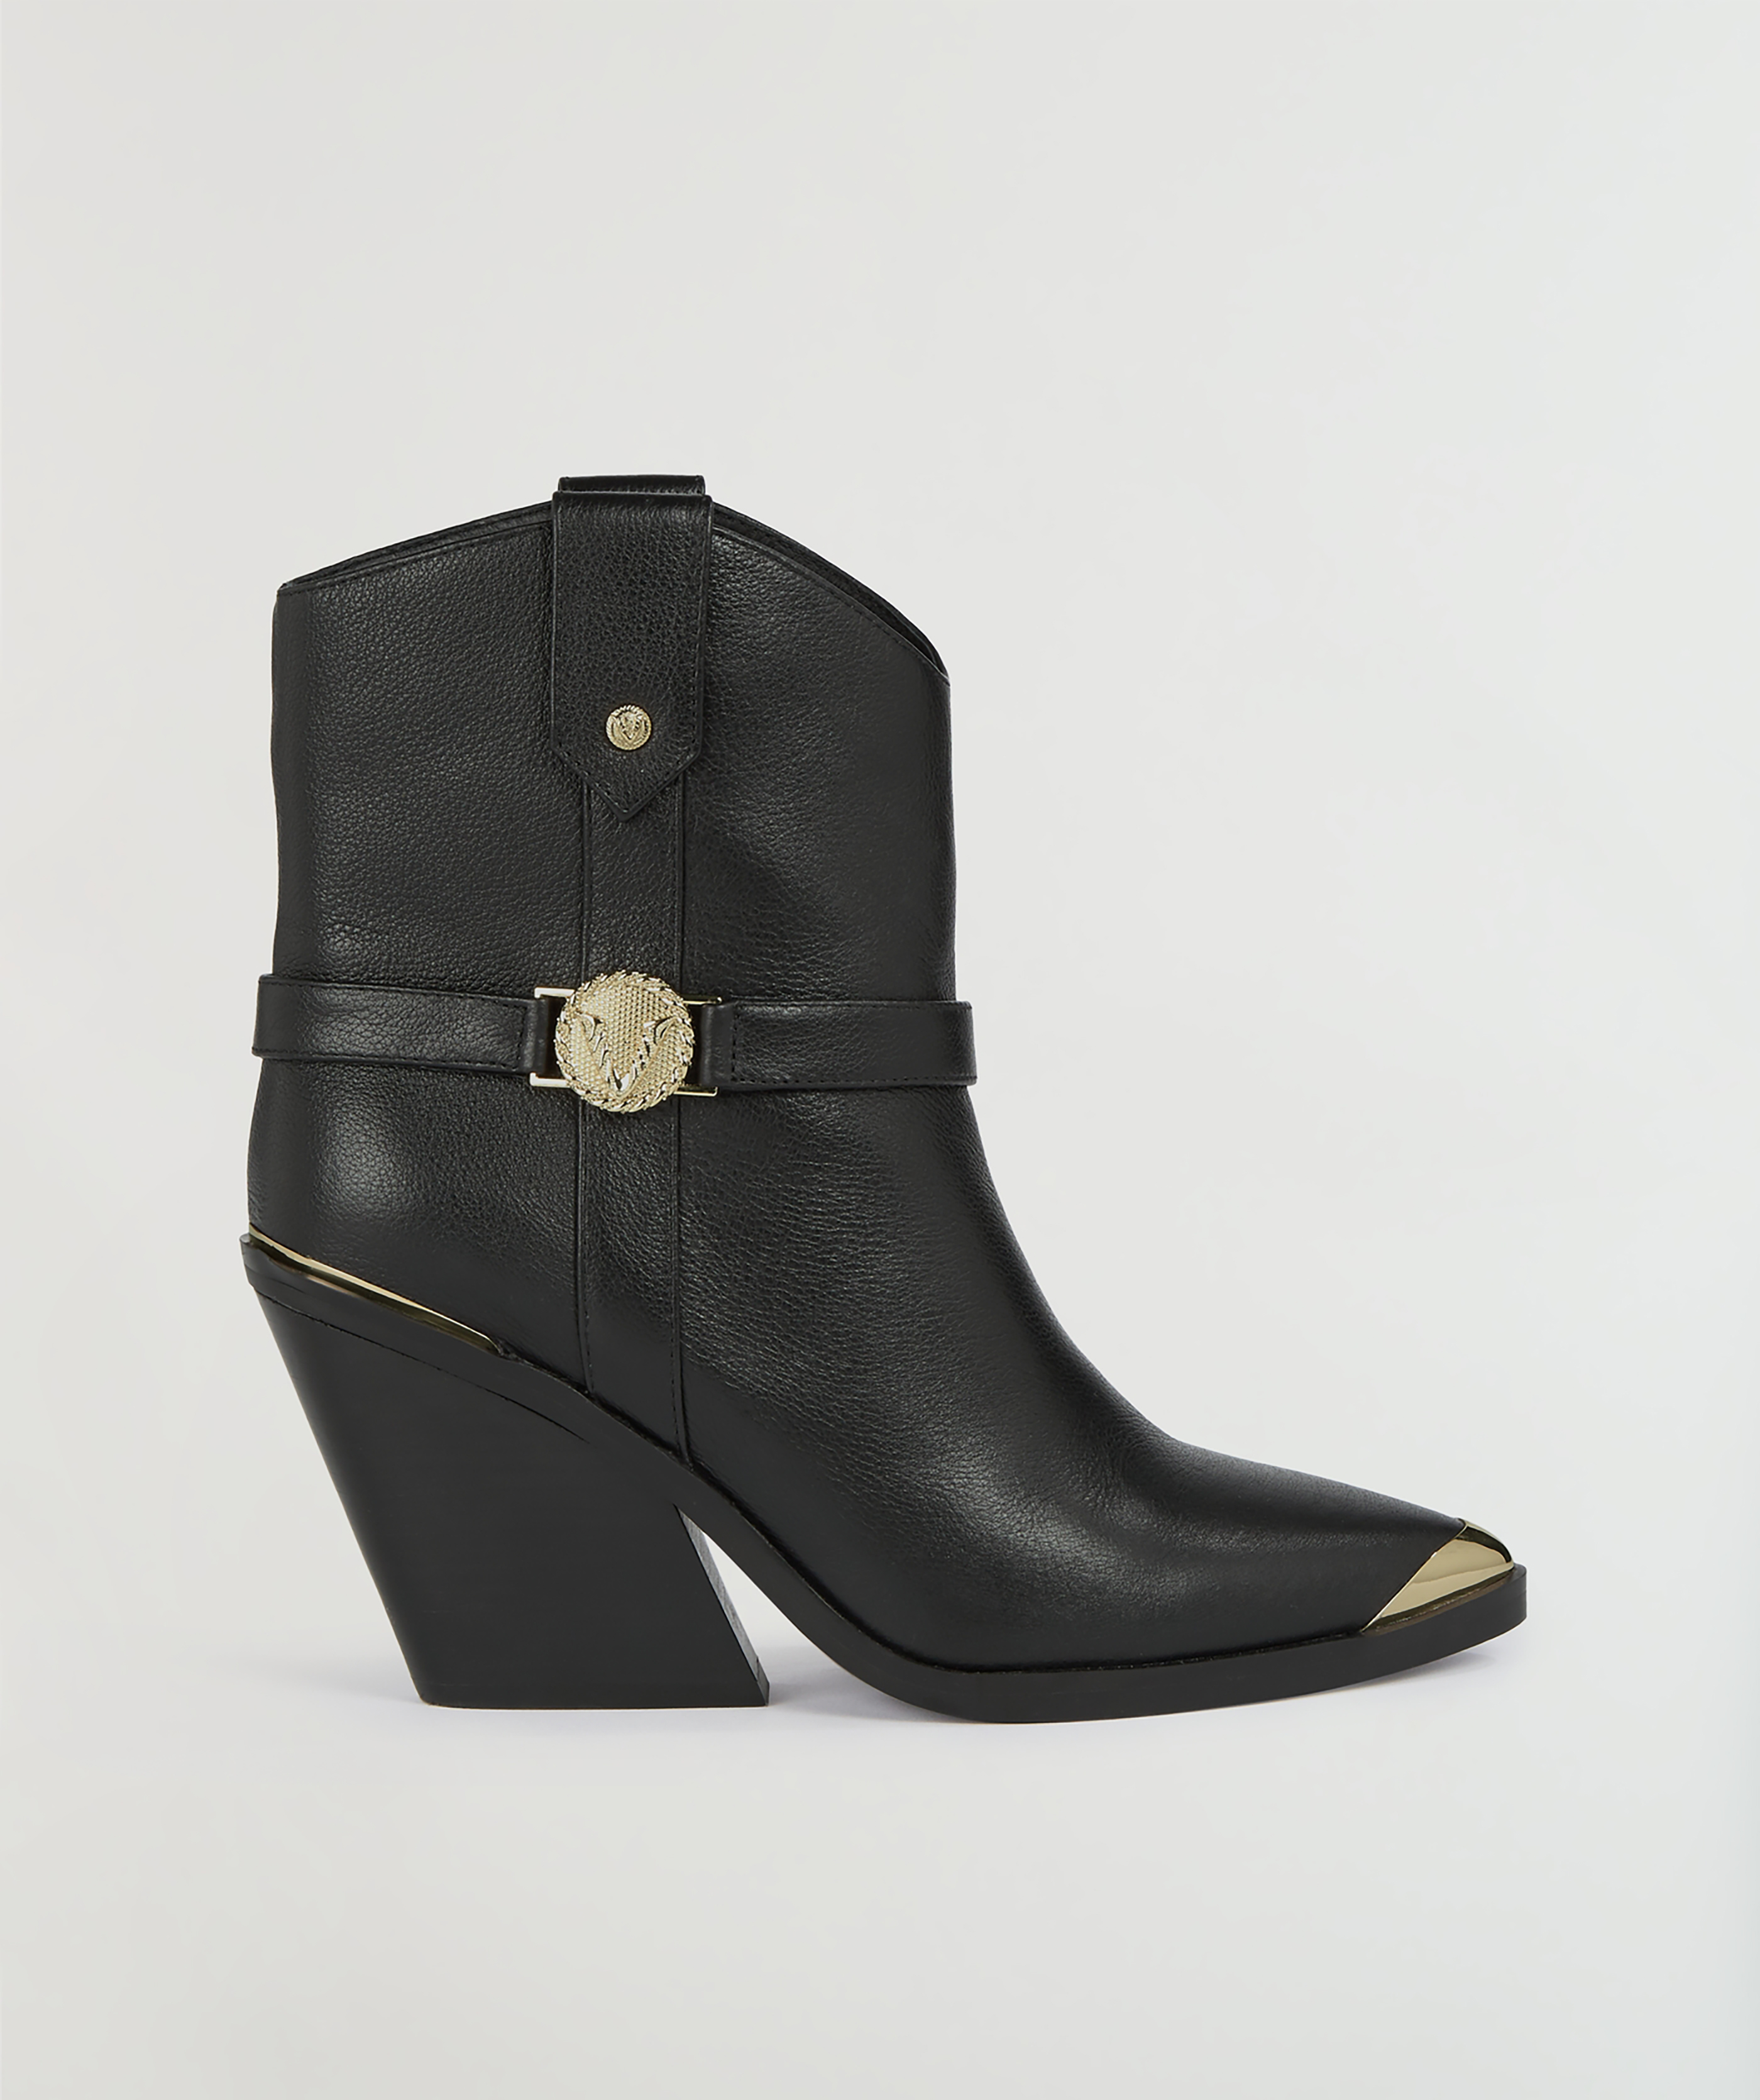 JOSH V JV LEANNA Boots